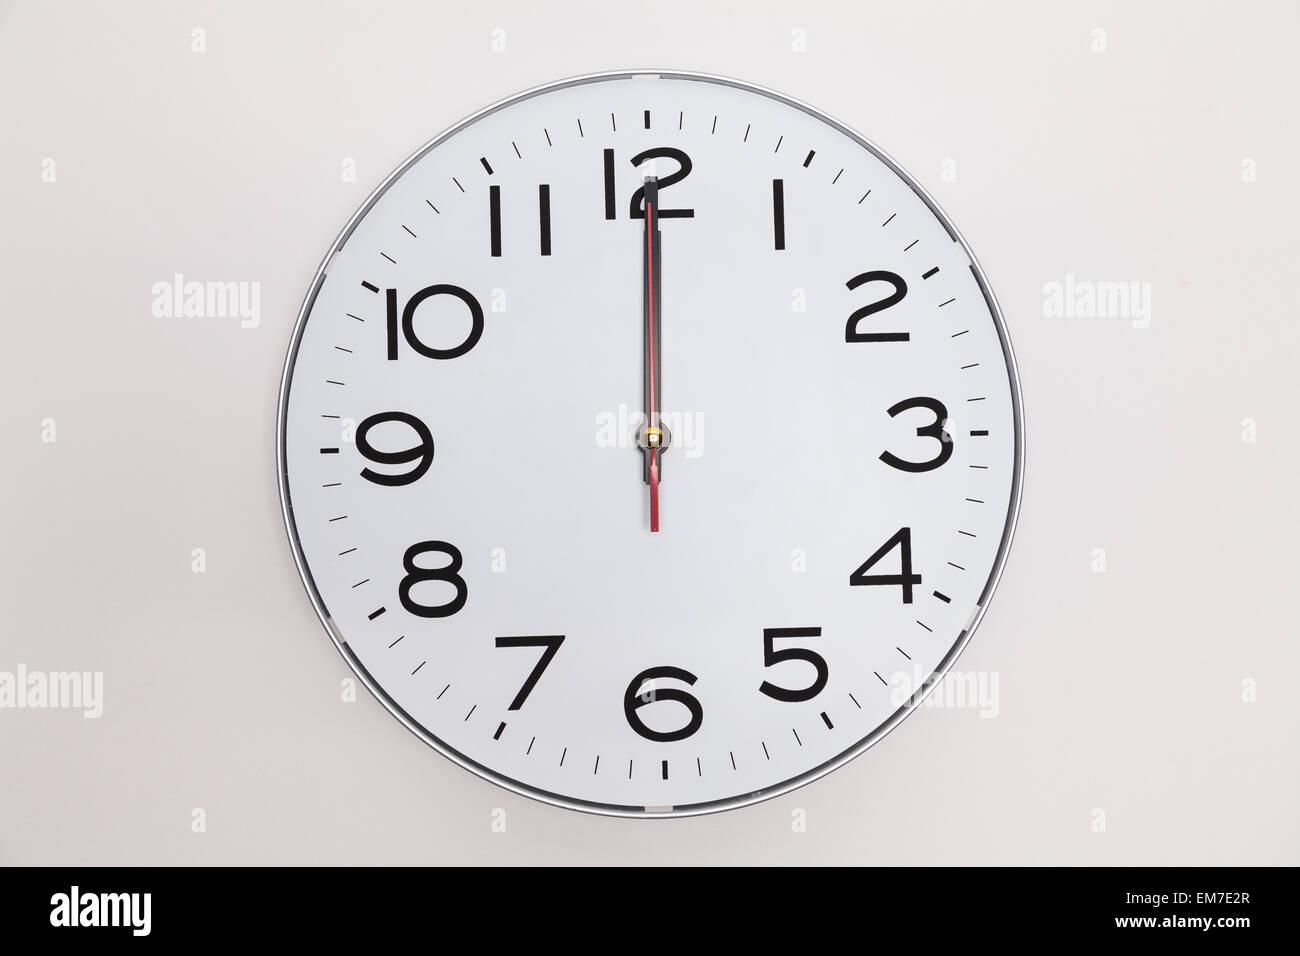 Twelve o'clock - Stock Image